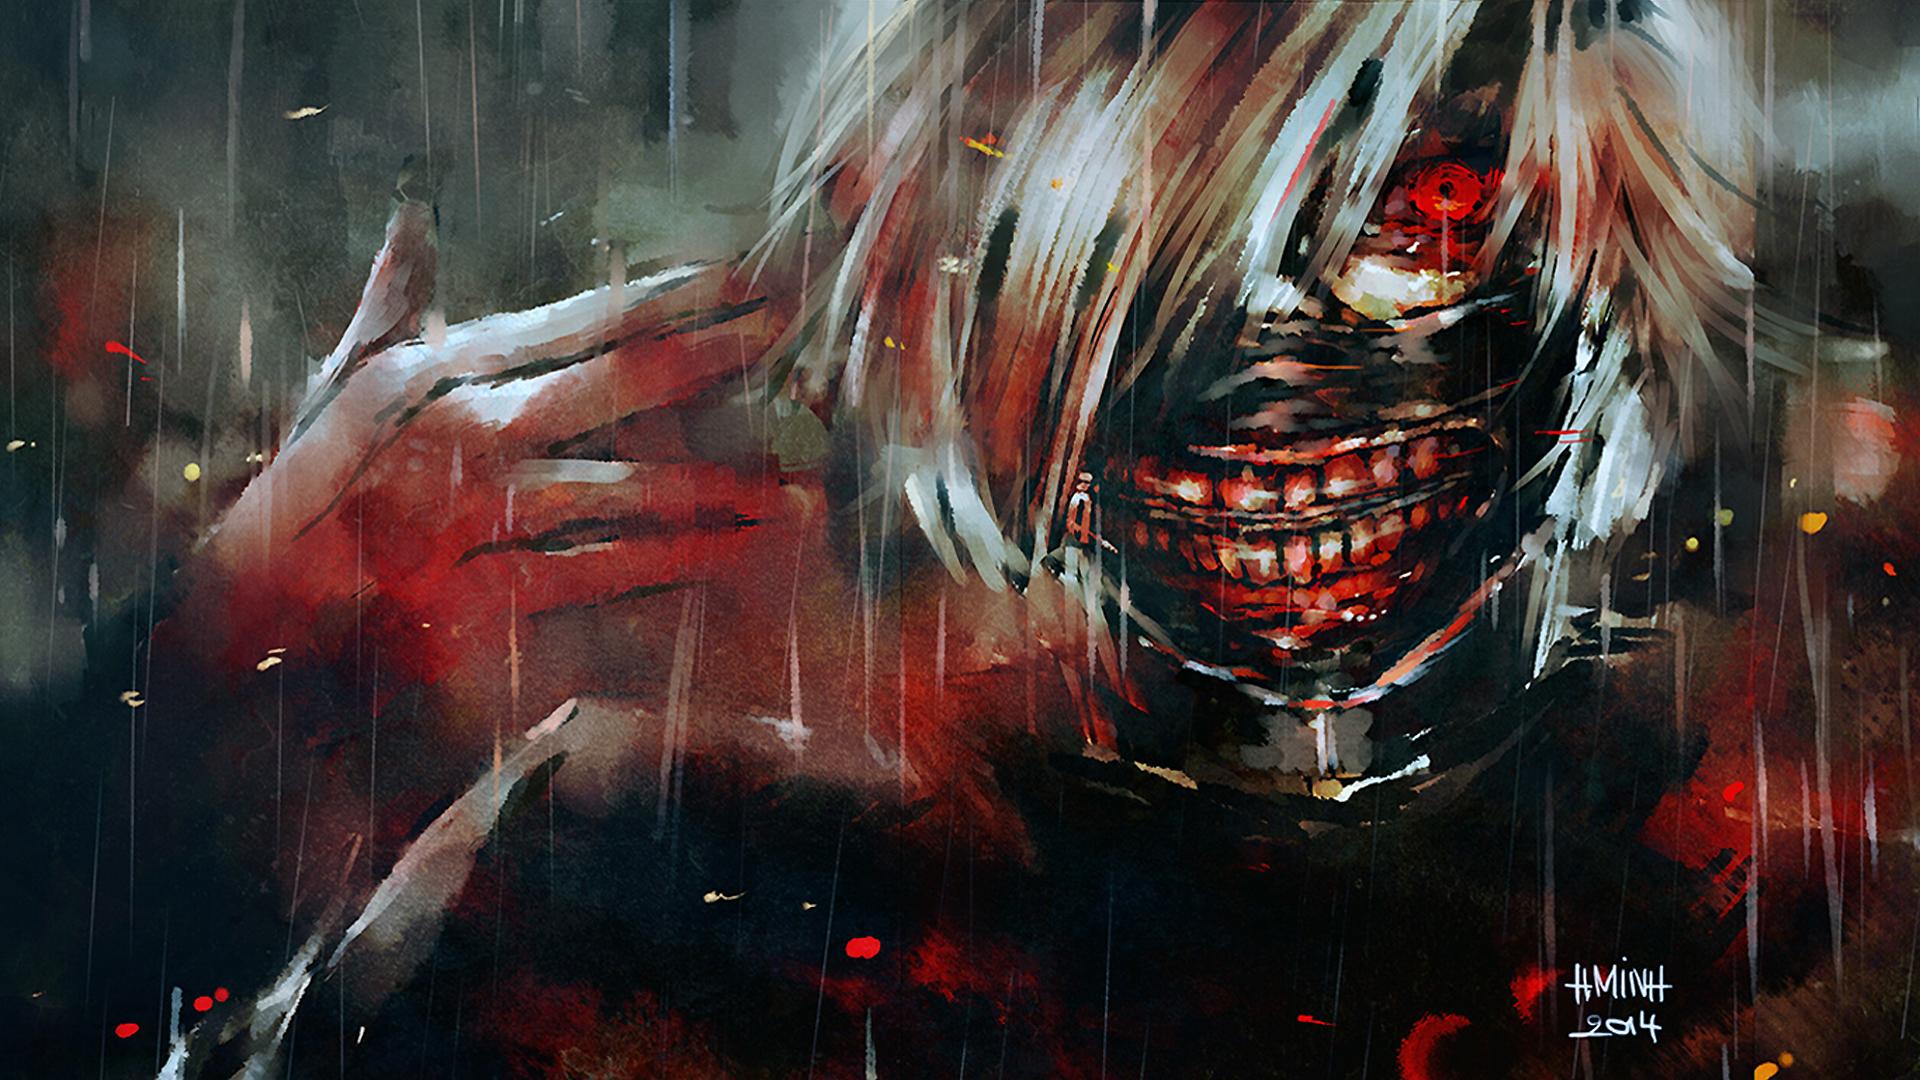 Tokyo Ghoul Fondo De Pantalla Hd Fondo De Escritorio